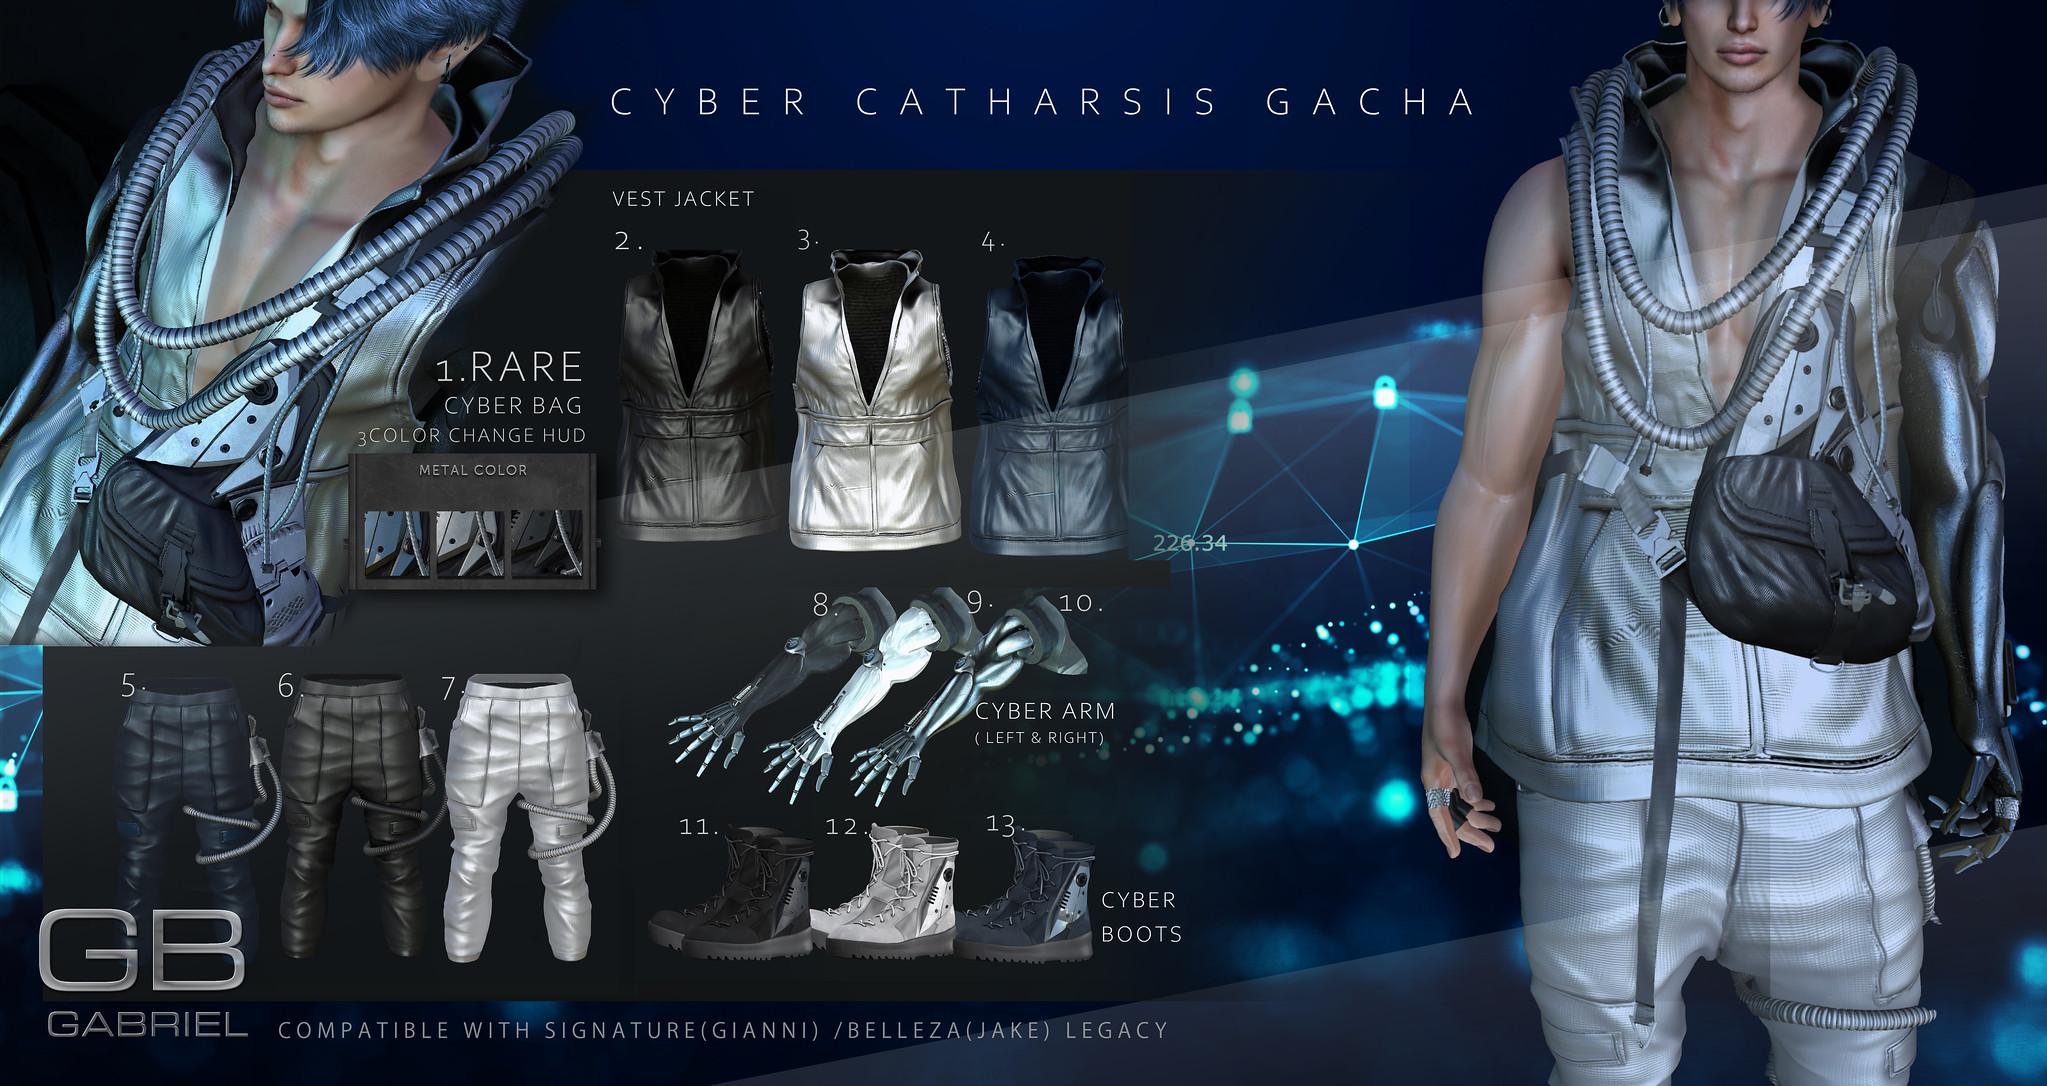 GABRIEL @ Cyber Fair June '21